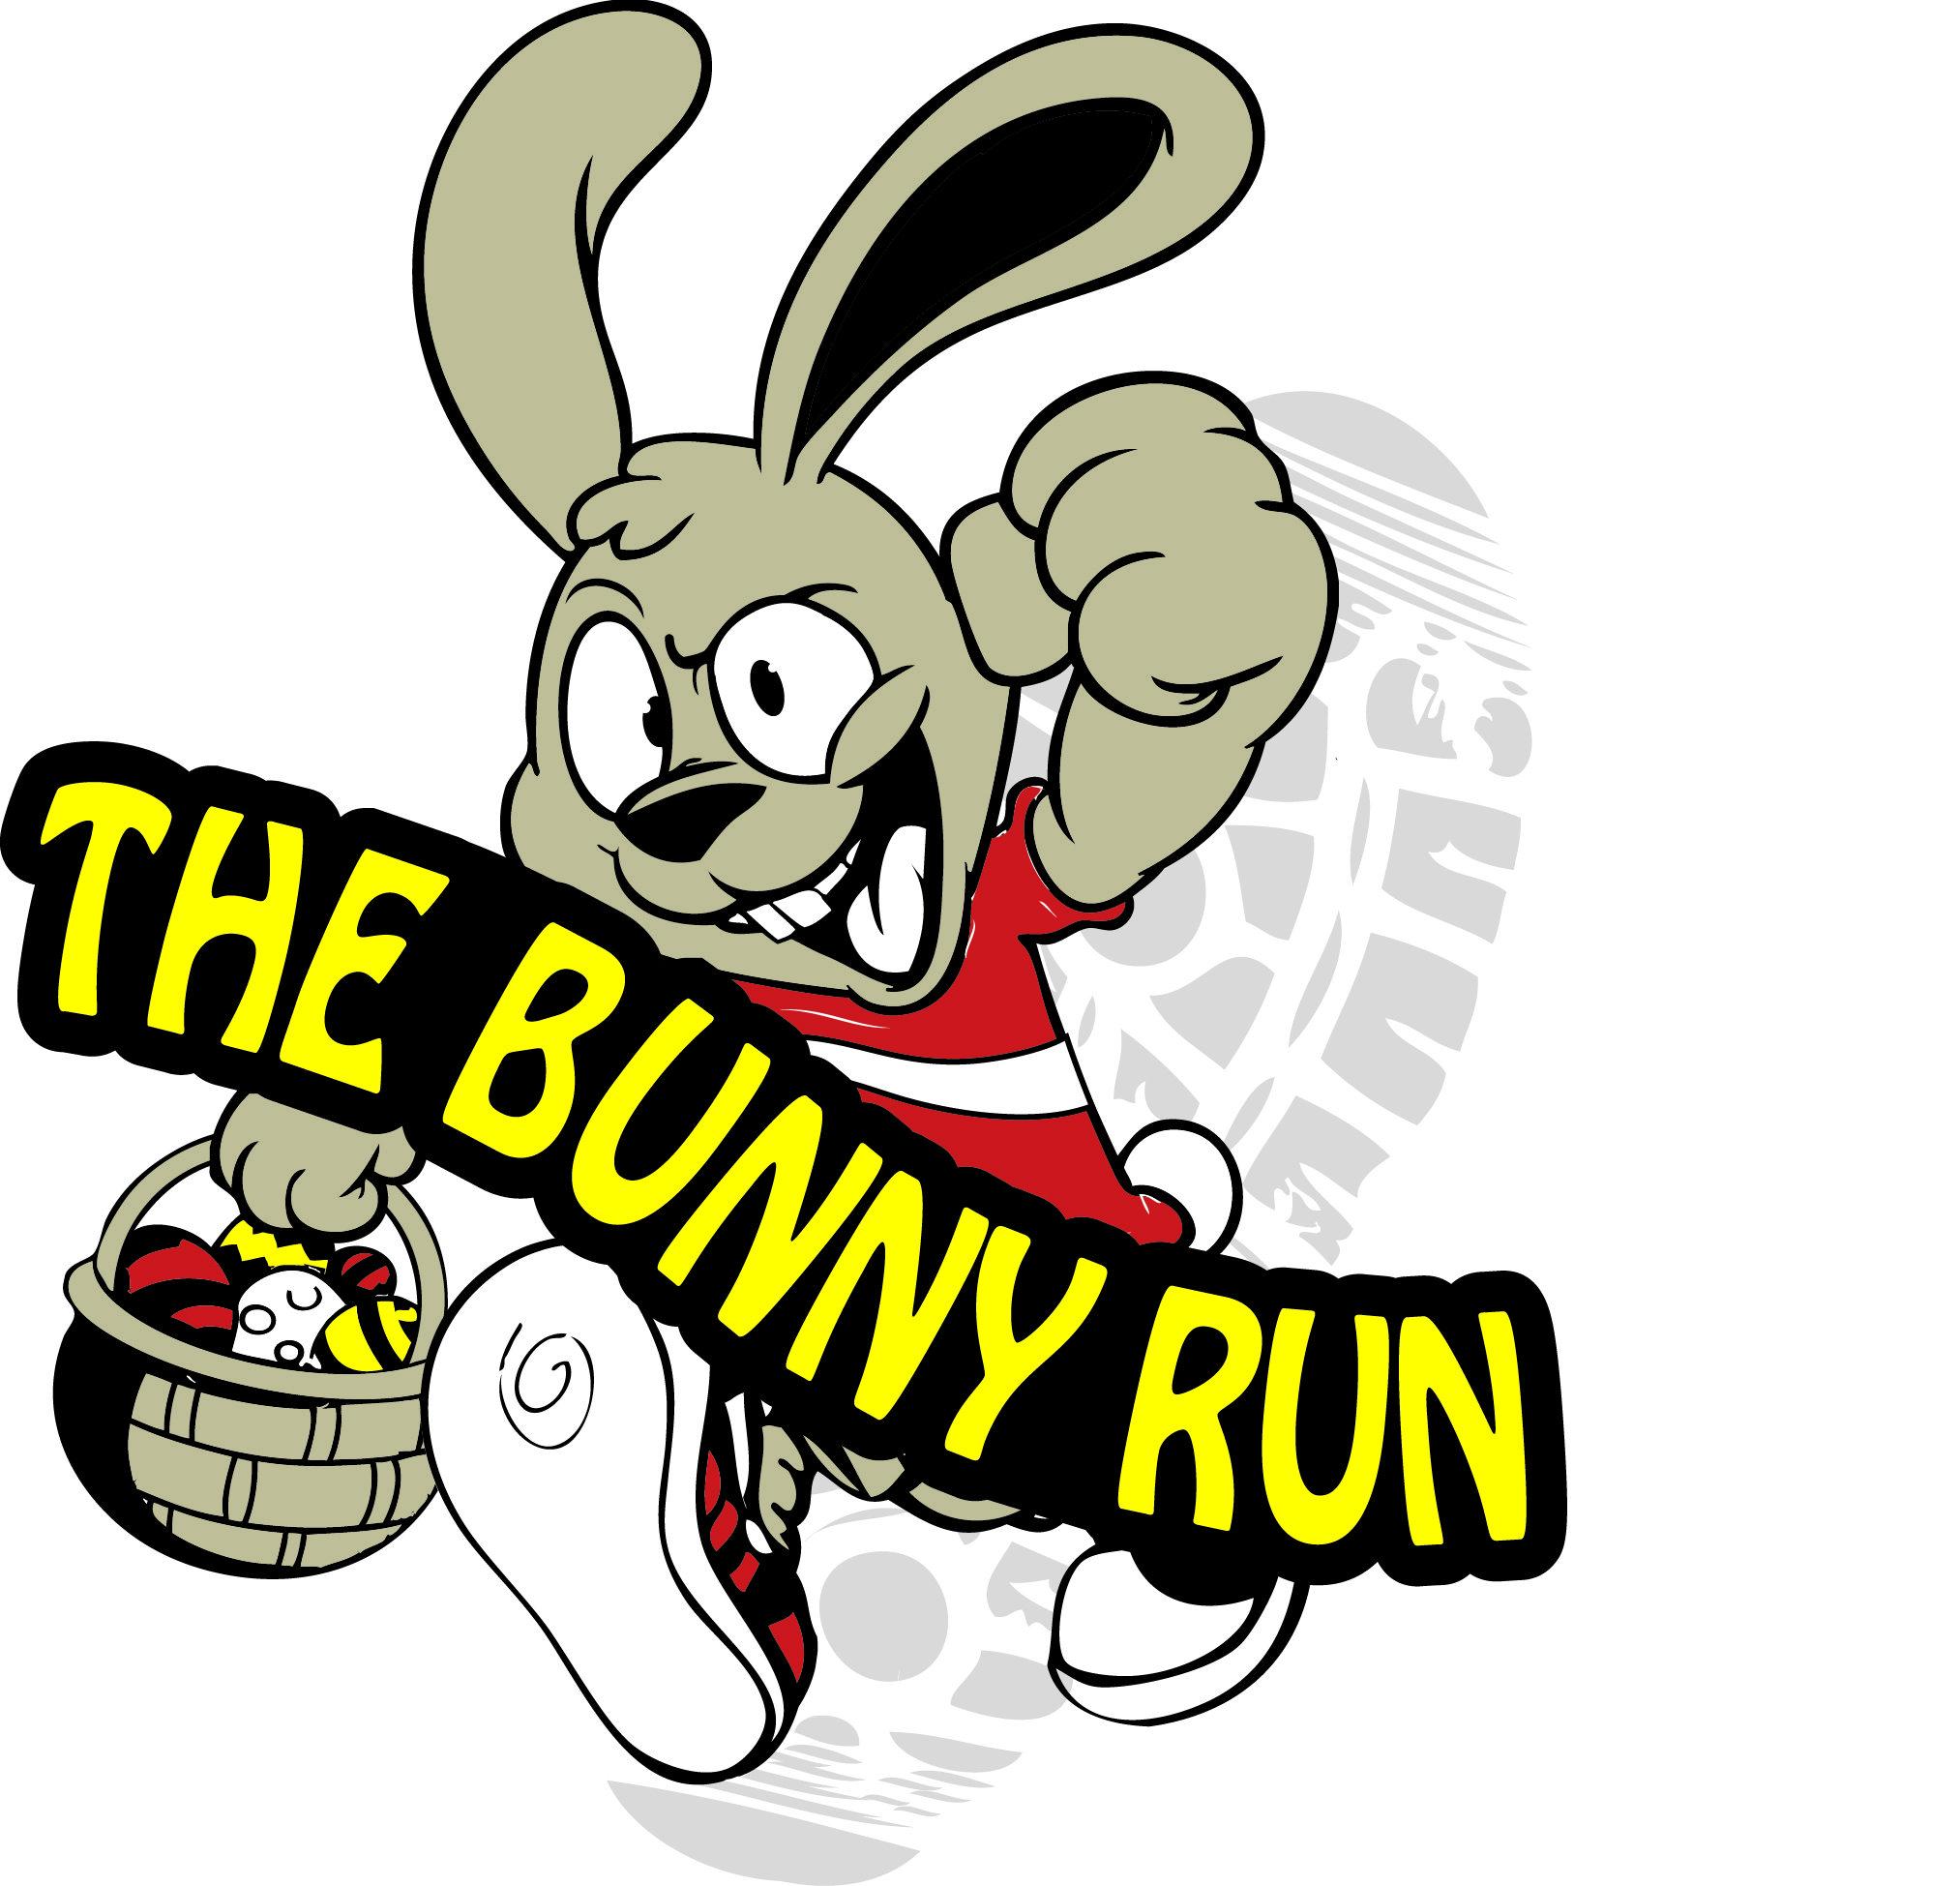 Race clipart bunny Bunny Events Falcon Upcoming Run